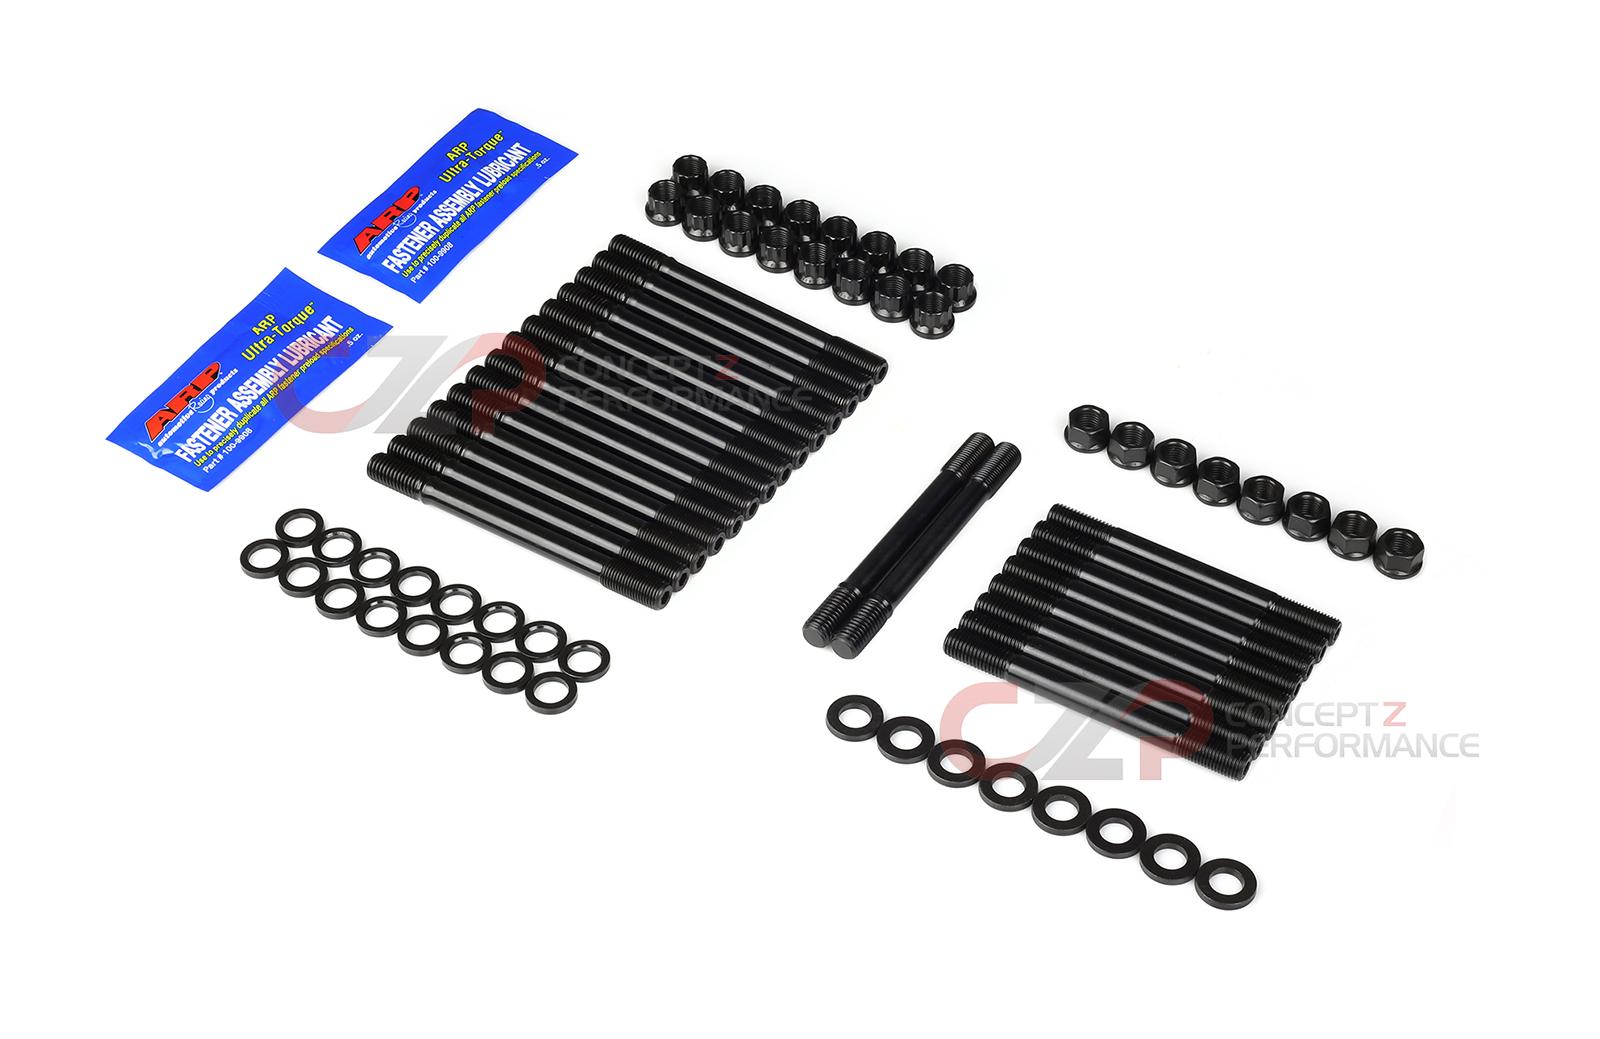 ACL Race Main Bearing Kit for Nissan 300ZX VG30 VG30DE VG30DETT